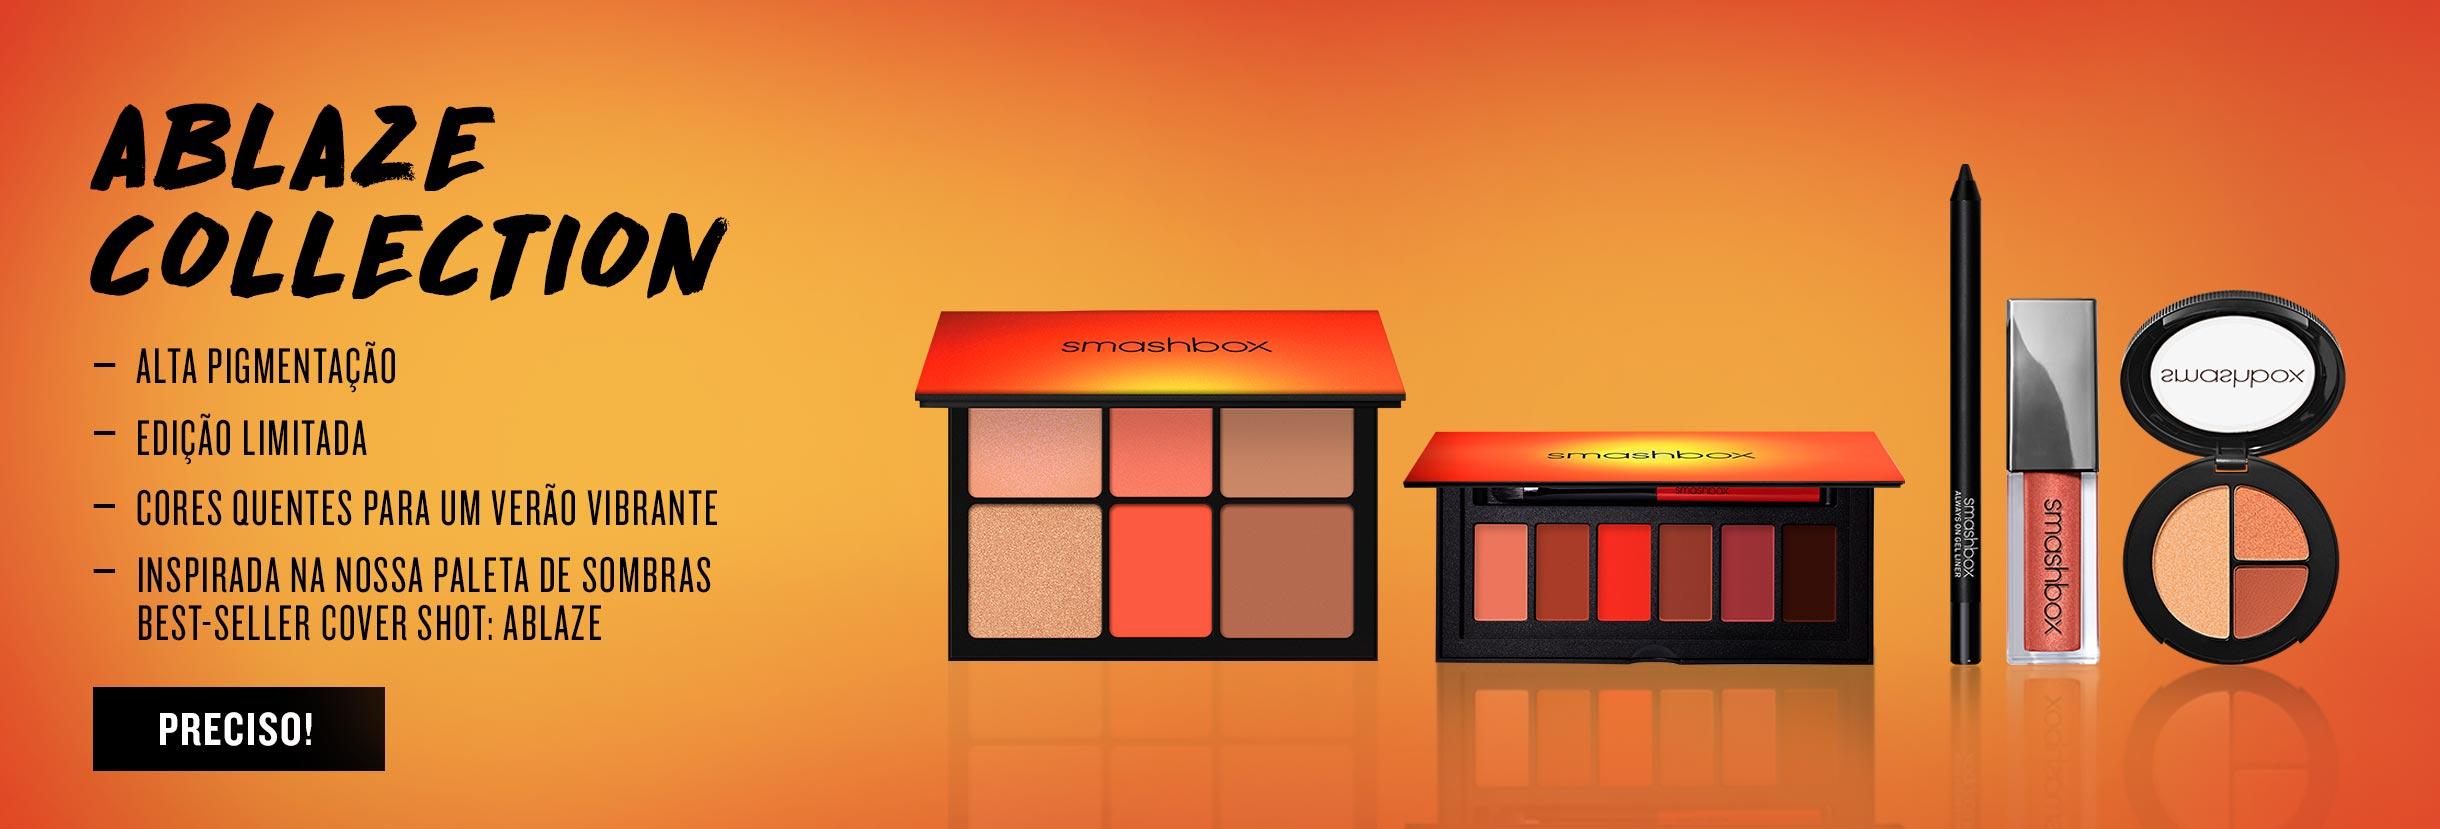 Ablaze Collection